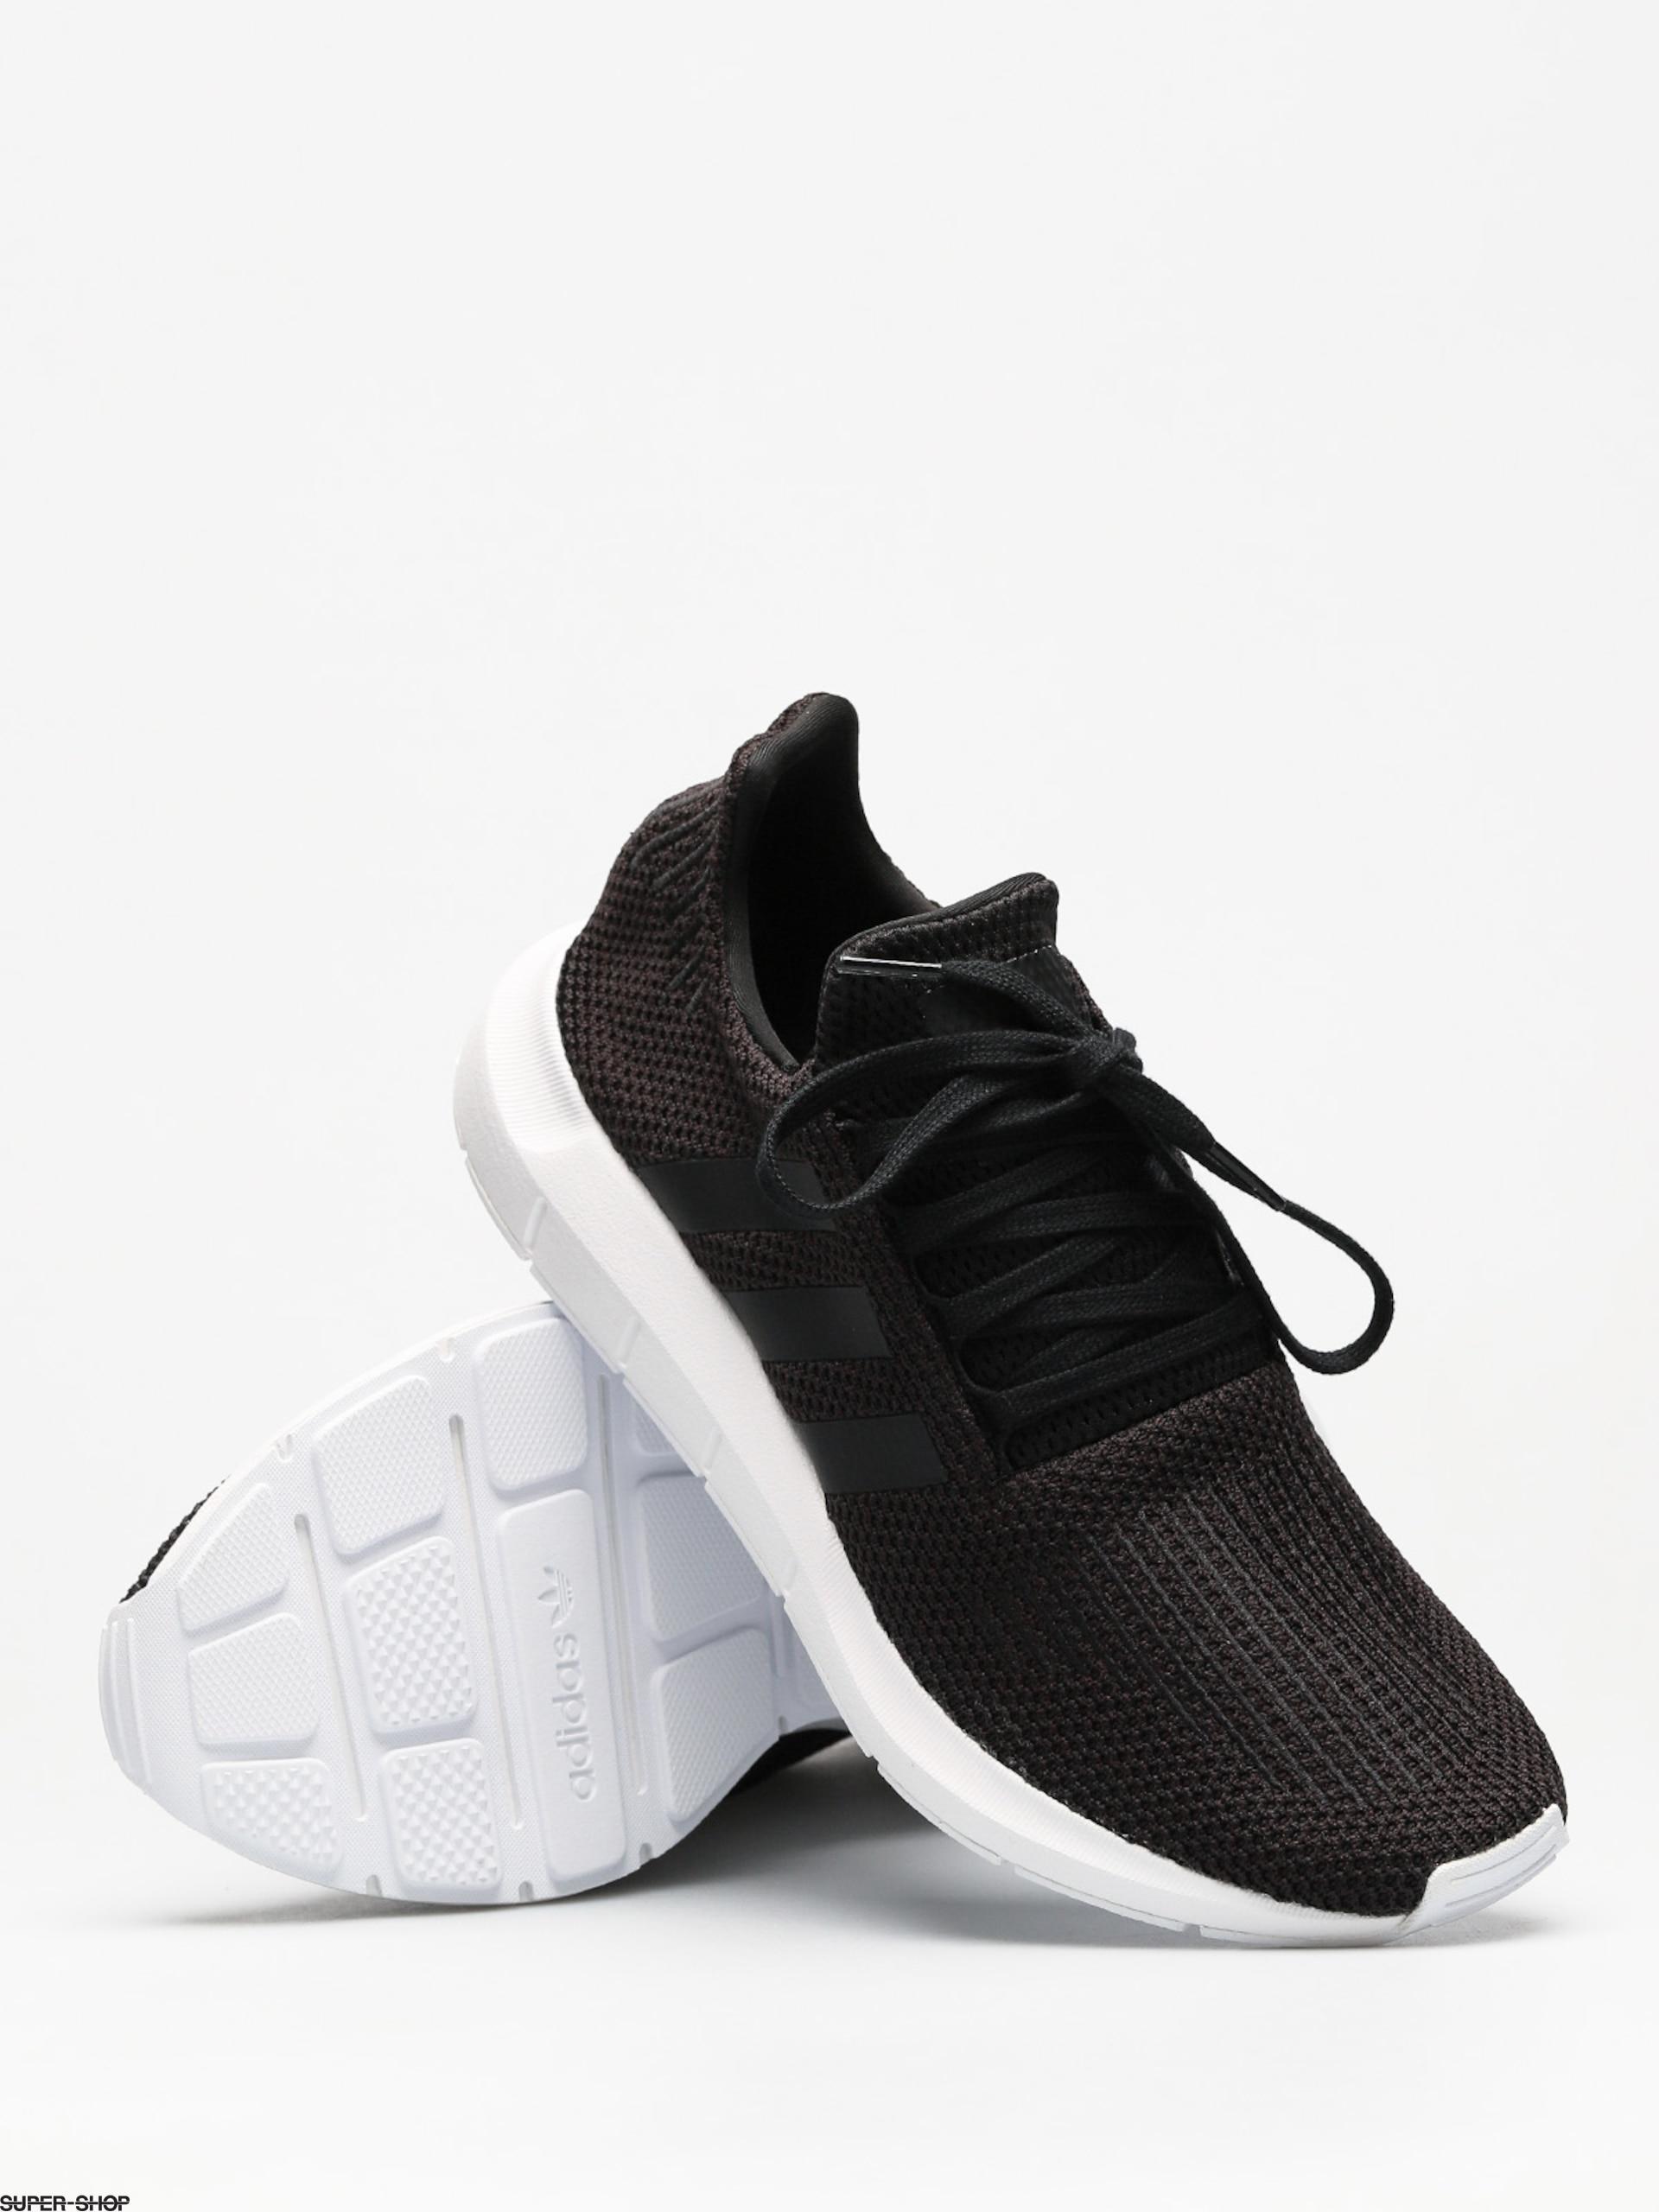 c81864642e6a7 adidas Shoes Swift Run (core black core black ftwr white)